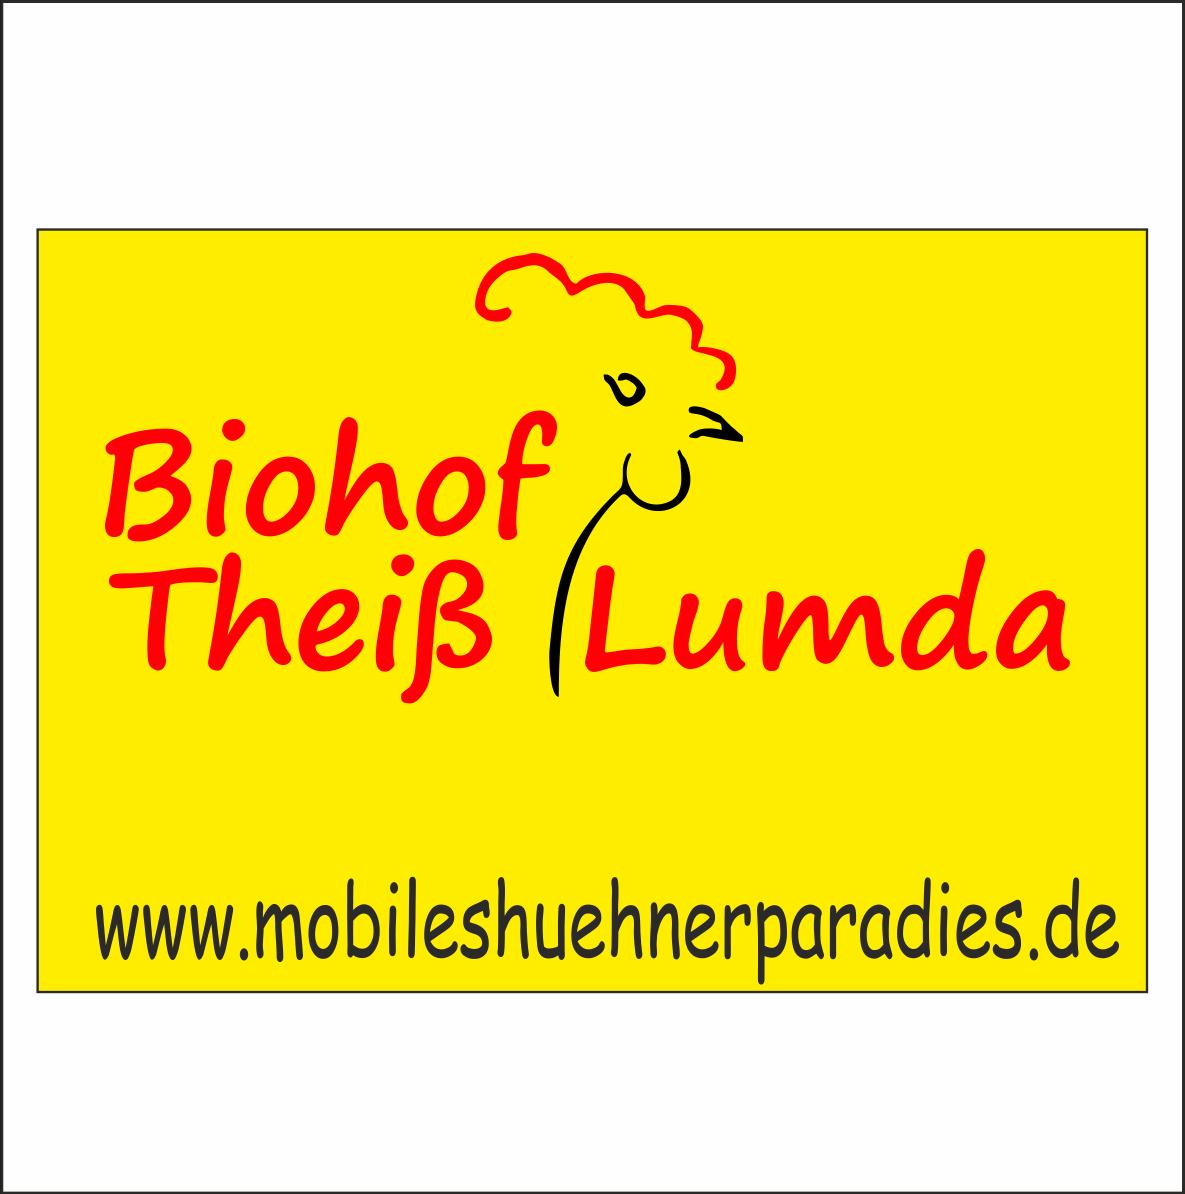 Biohof Theiß